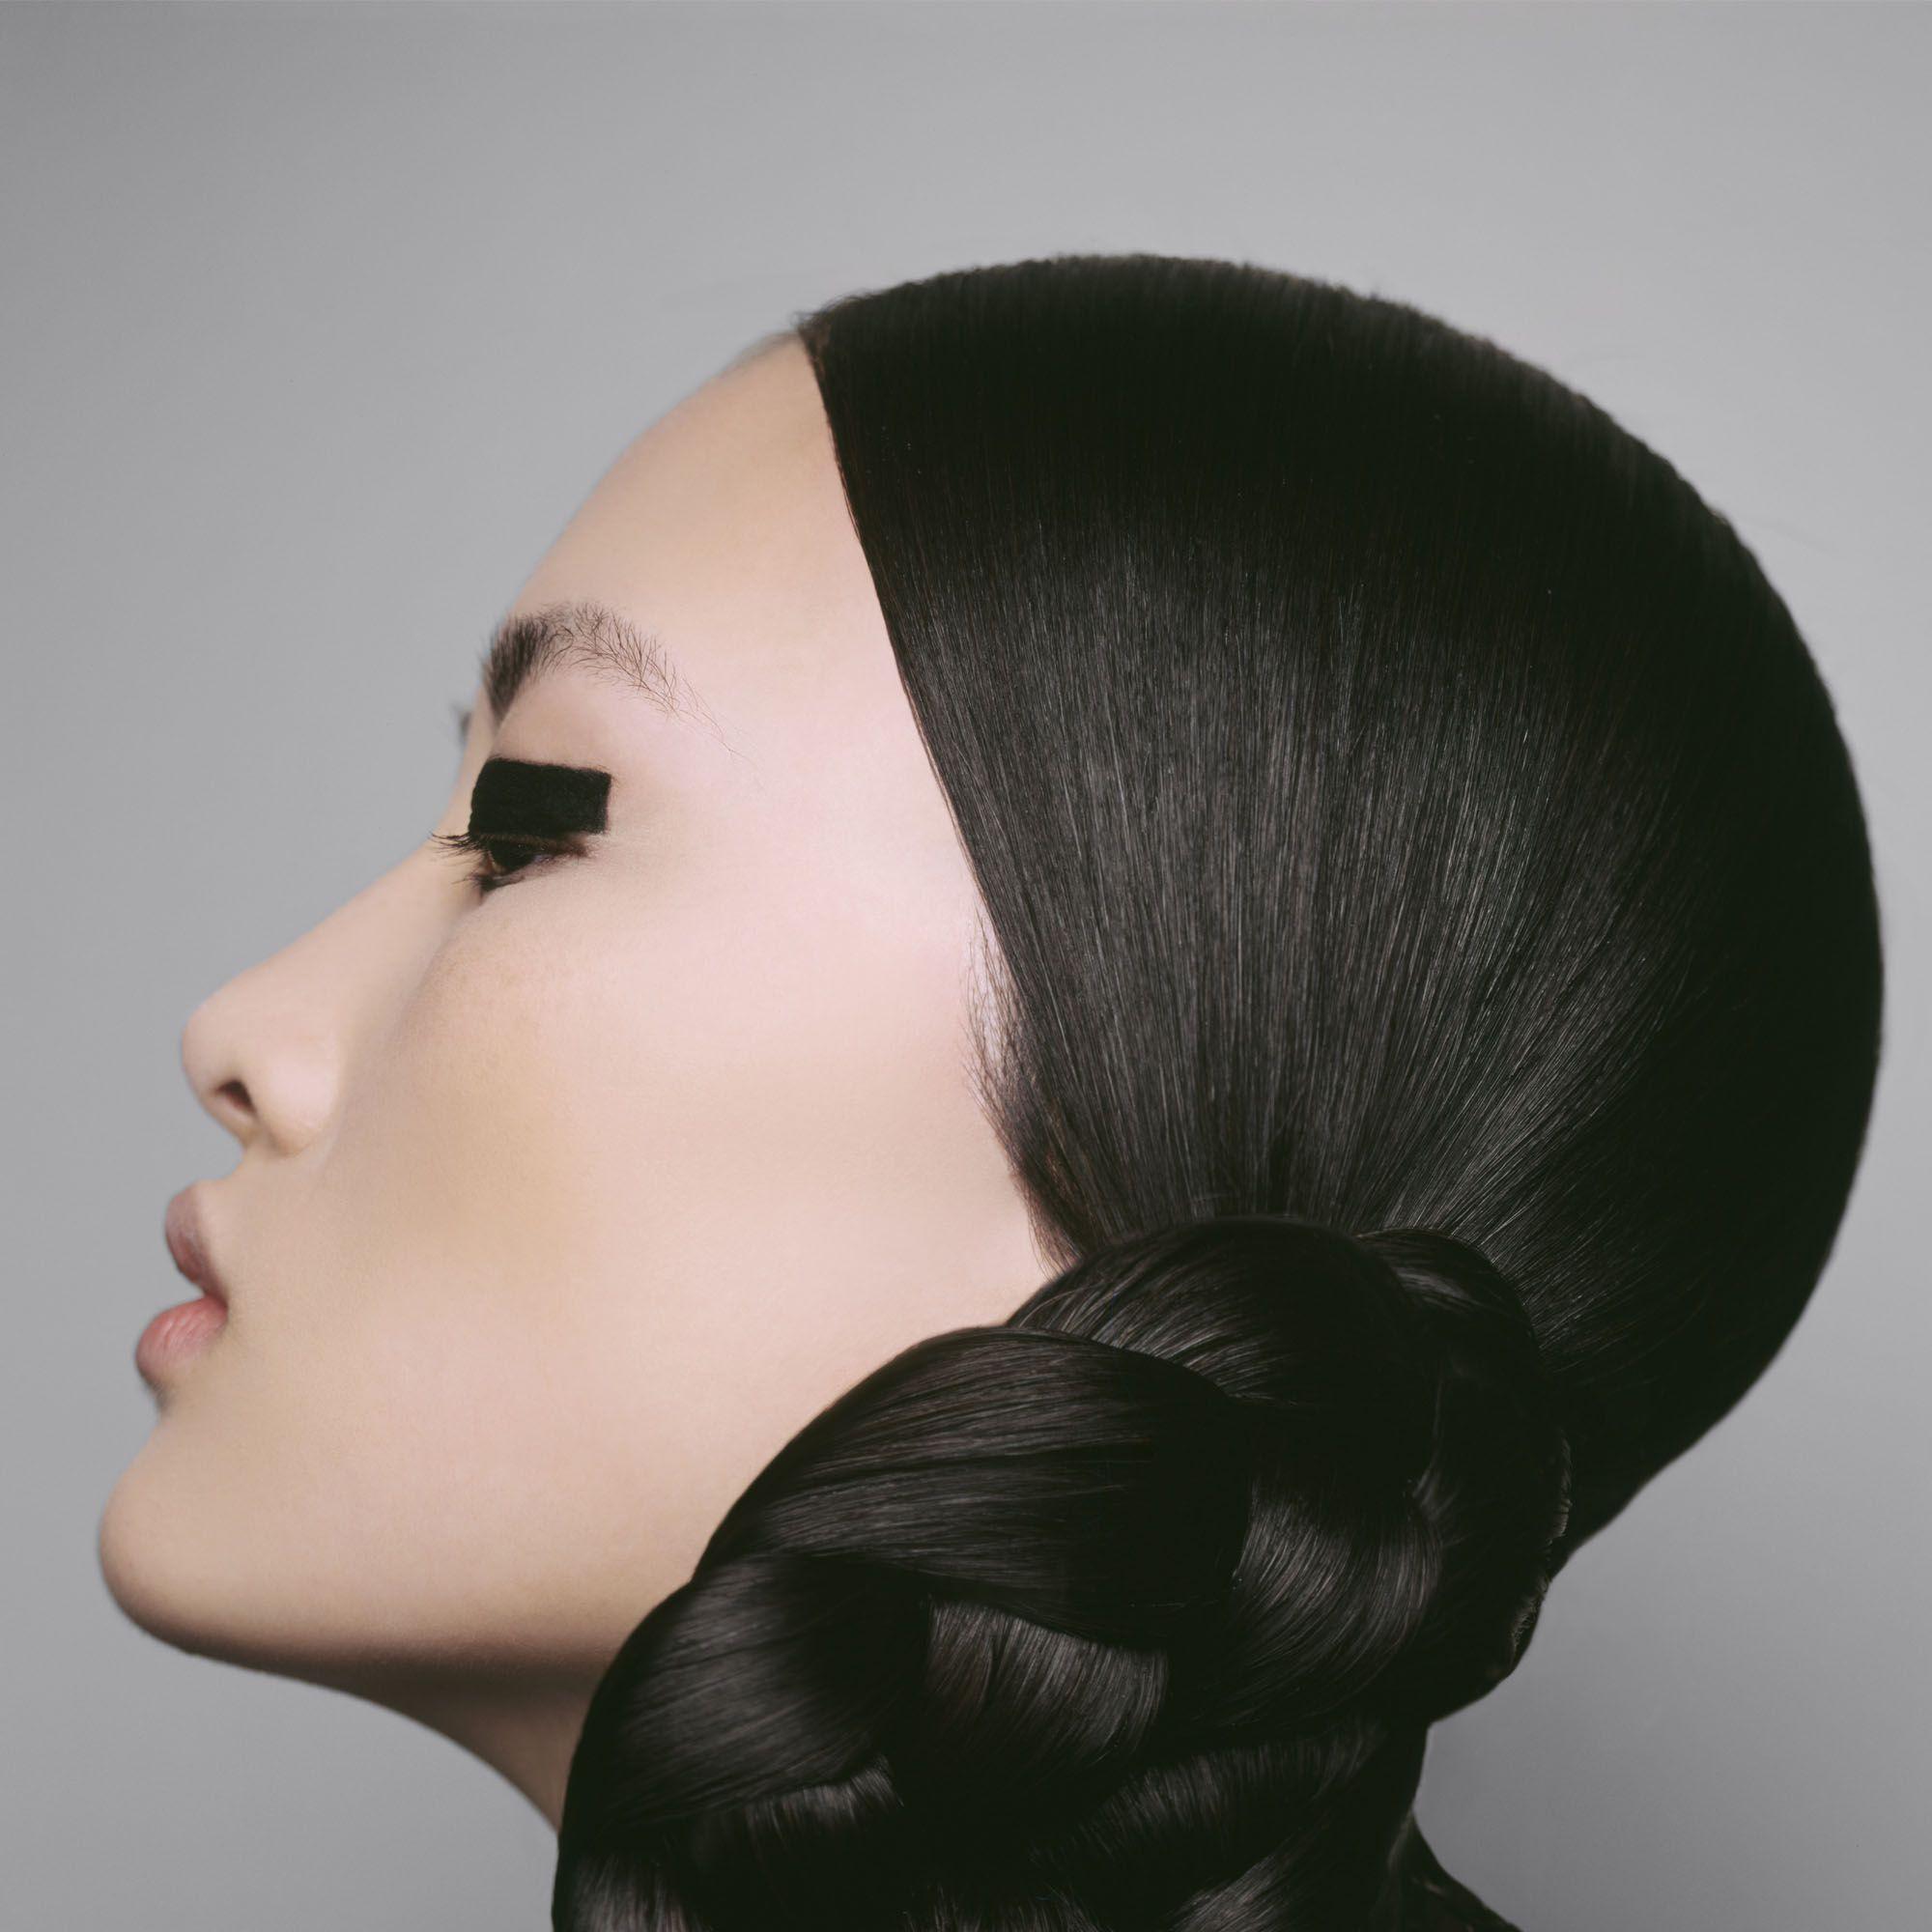 "<em>Beauty, Dior</em><strong>Dior</strong> Diorshow Khol Stick in Smoky Black, $32, <a target=""_blank"" href=""http://www.sephora.com/diorshow-khol-stick-P393133?skuId=1665298&amp&#x3B;om_mmc=ppc-GG&amp&#x3B;mkwid=ywcf2hLH&amp&#x3B;pcrid=49113159039&amp&#x3B;pdv=c&amp&#x3B;site=us_search&amp&#x3B;country_switch=us&amp&#x3B;lang=en&amp&#x3B;gclid=CjwKEAjw3YipBRDL2bHhjLmFkQsSJADtzktjYNSsJgFOL6PW22wkTrNRYuzbjDXJ9RPdoaWYYTuIfBoCVKrw_wcB"">sephora.com</a>. <em>Fashion, Dior</em><strong>Dior</strong> turtleneck, $2,800, 800-929-DIOR."